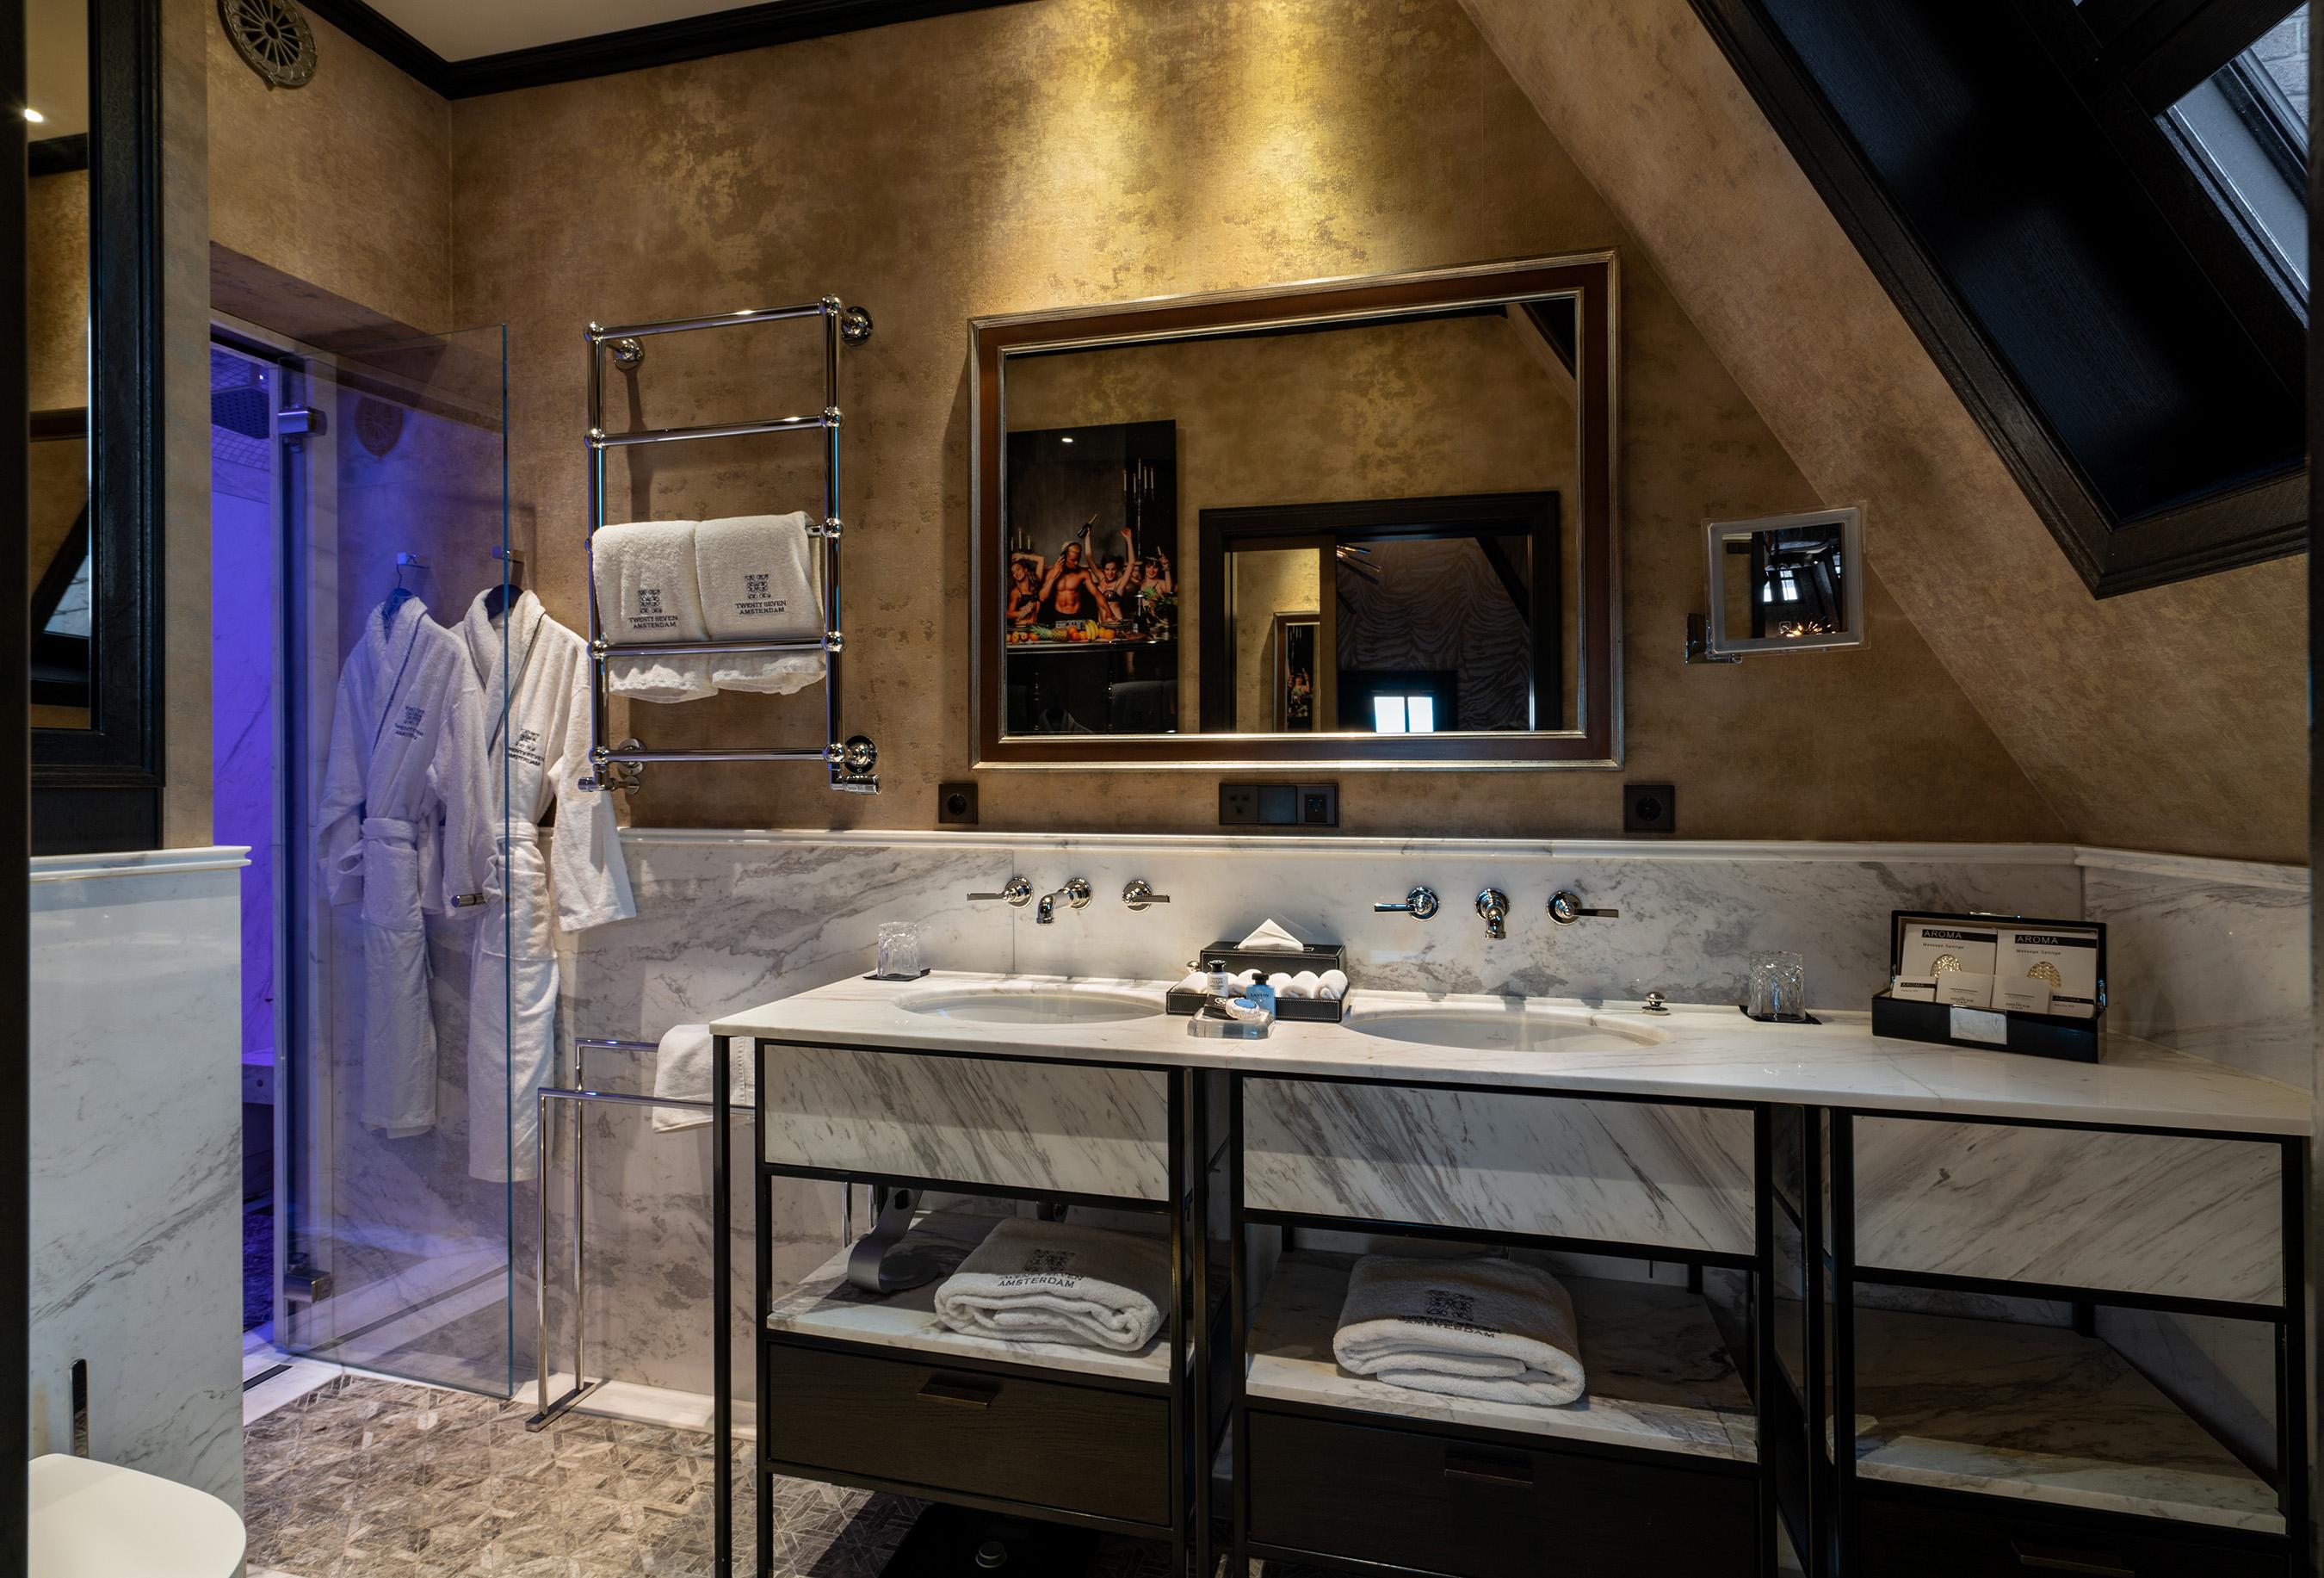 Twentyseven hotel amsterdam rooftop stage suite bathroom